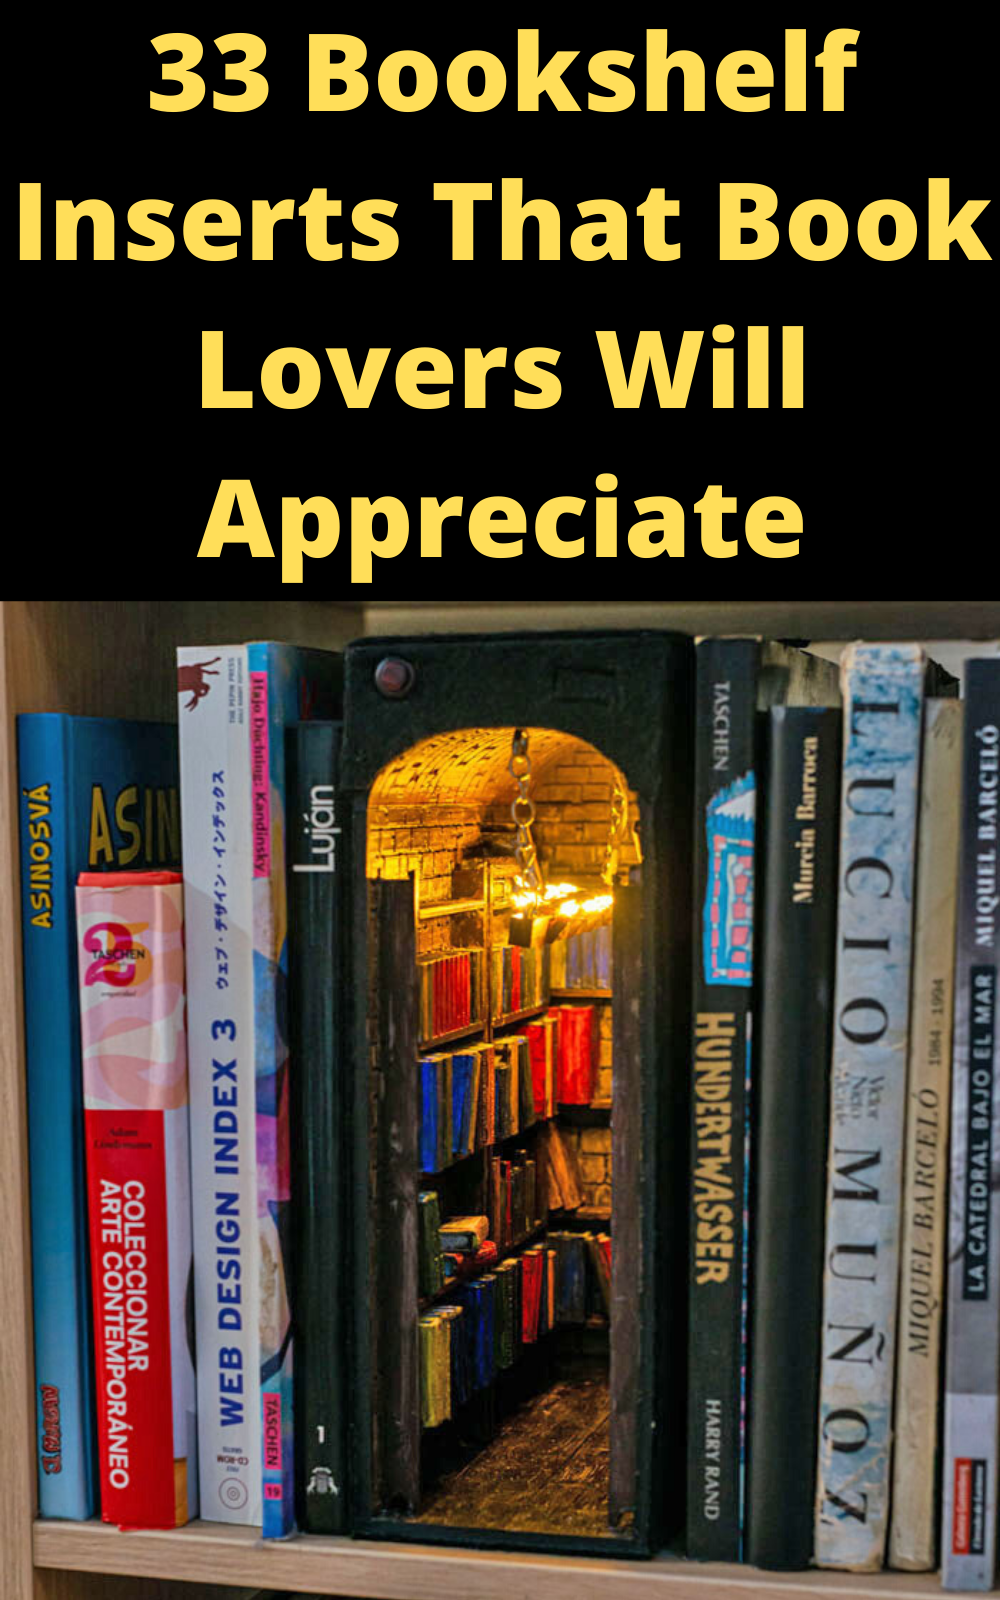 33 Bookshelf Inserts That Book Lovers Will Appreciate